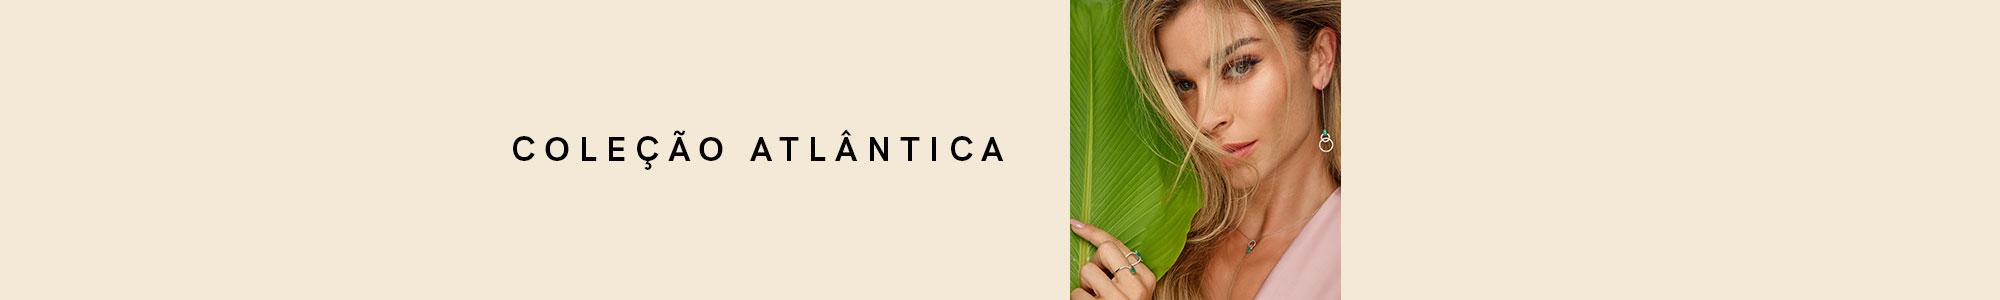 banner-atlantica